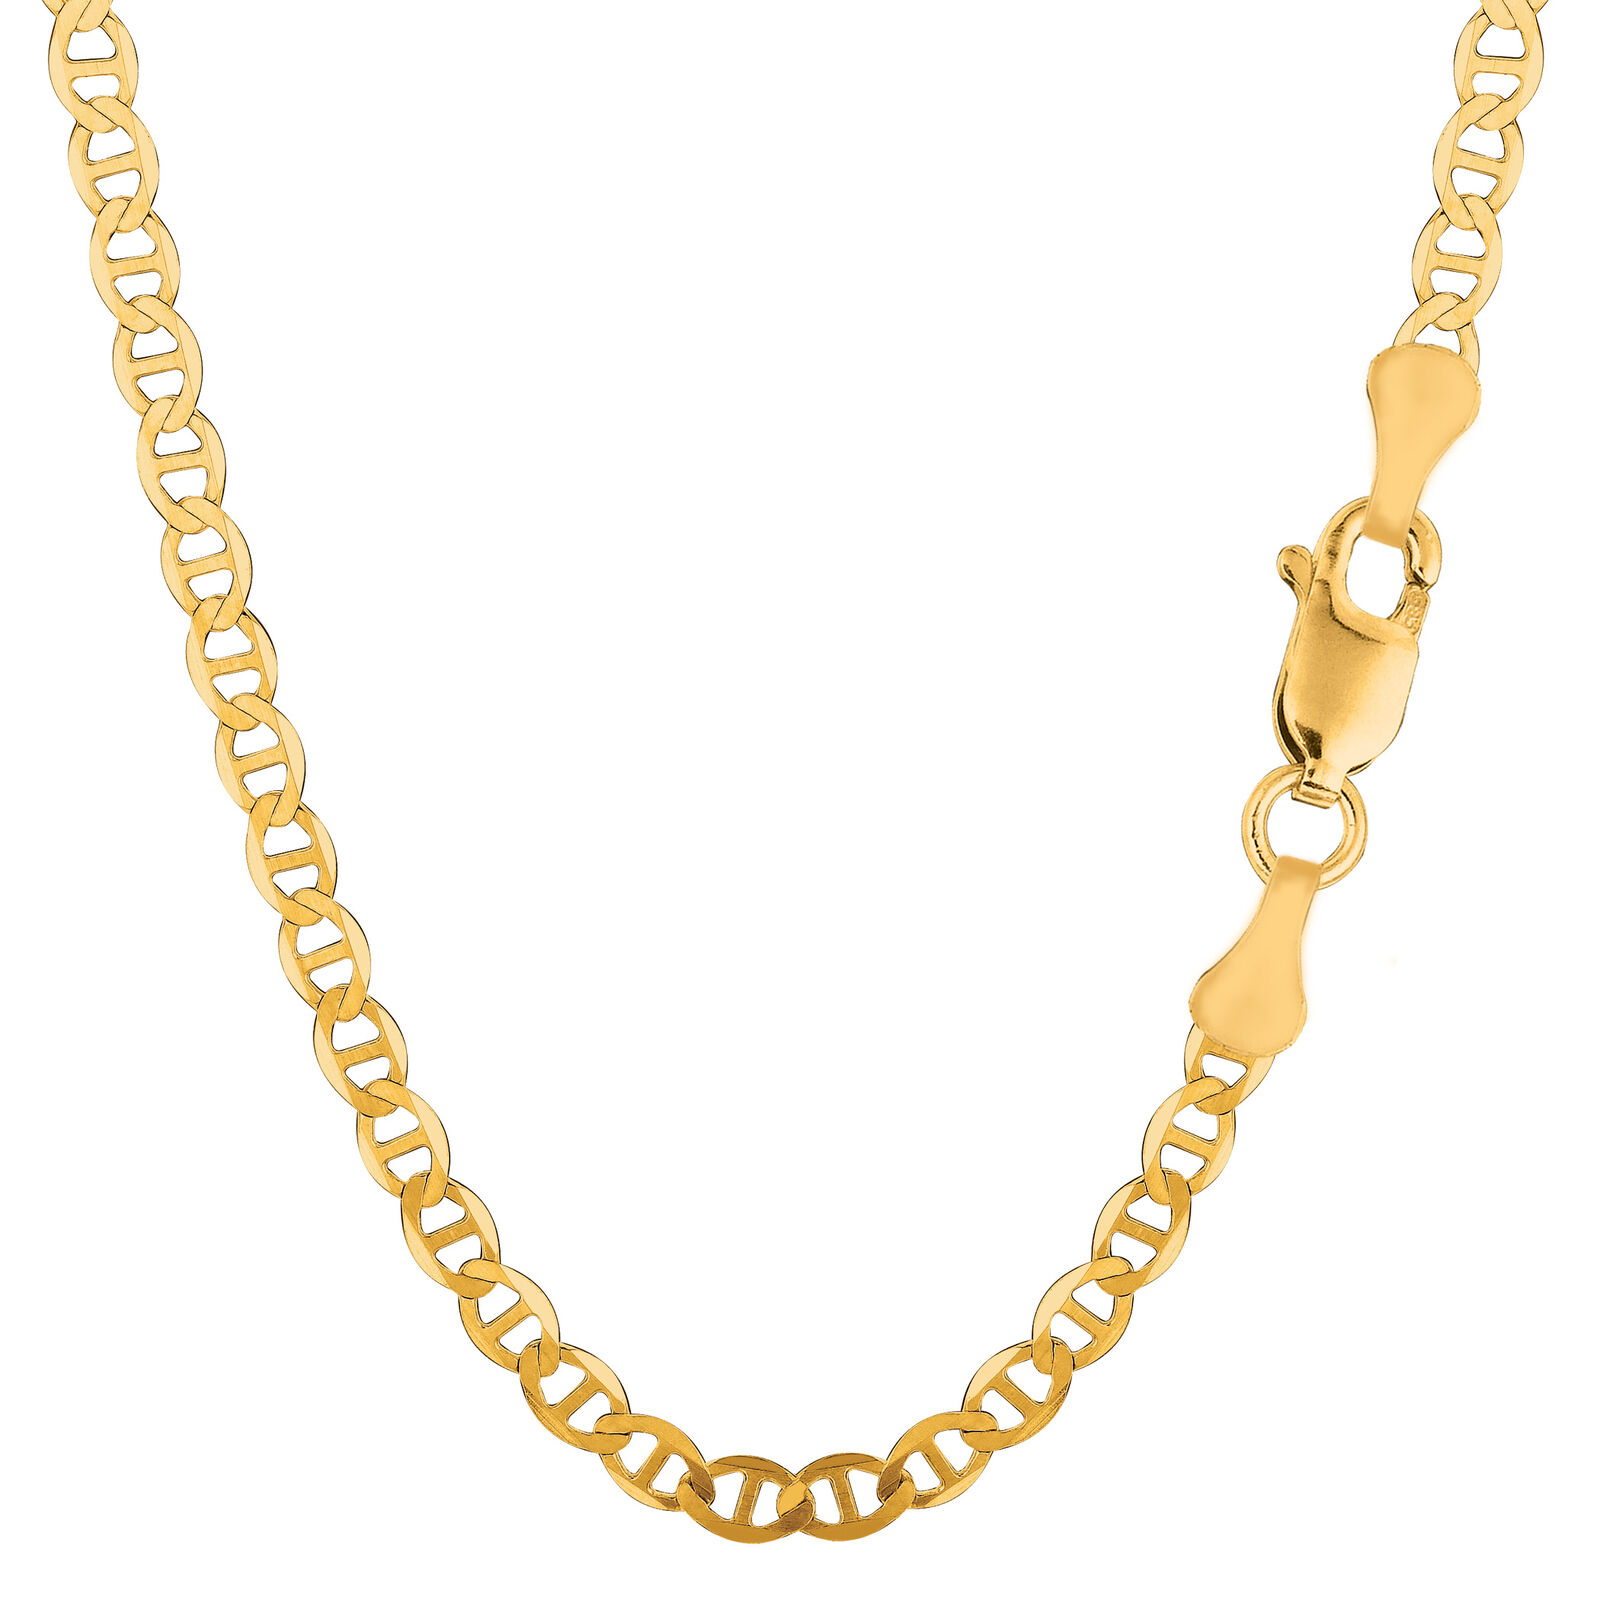 14K Yellow gold Mariner Link Chain, 4.5 mm